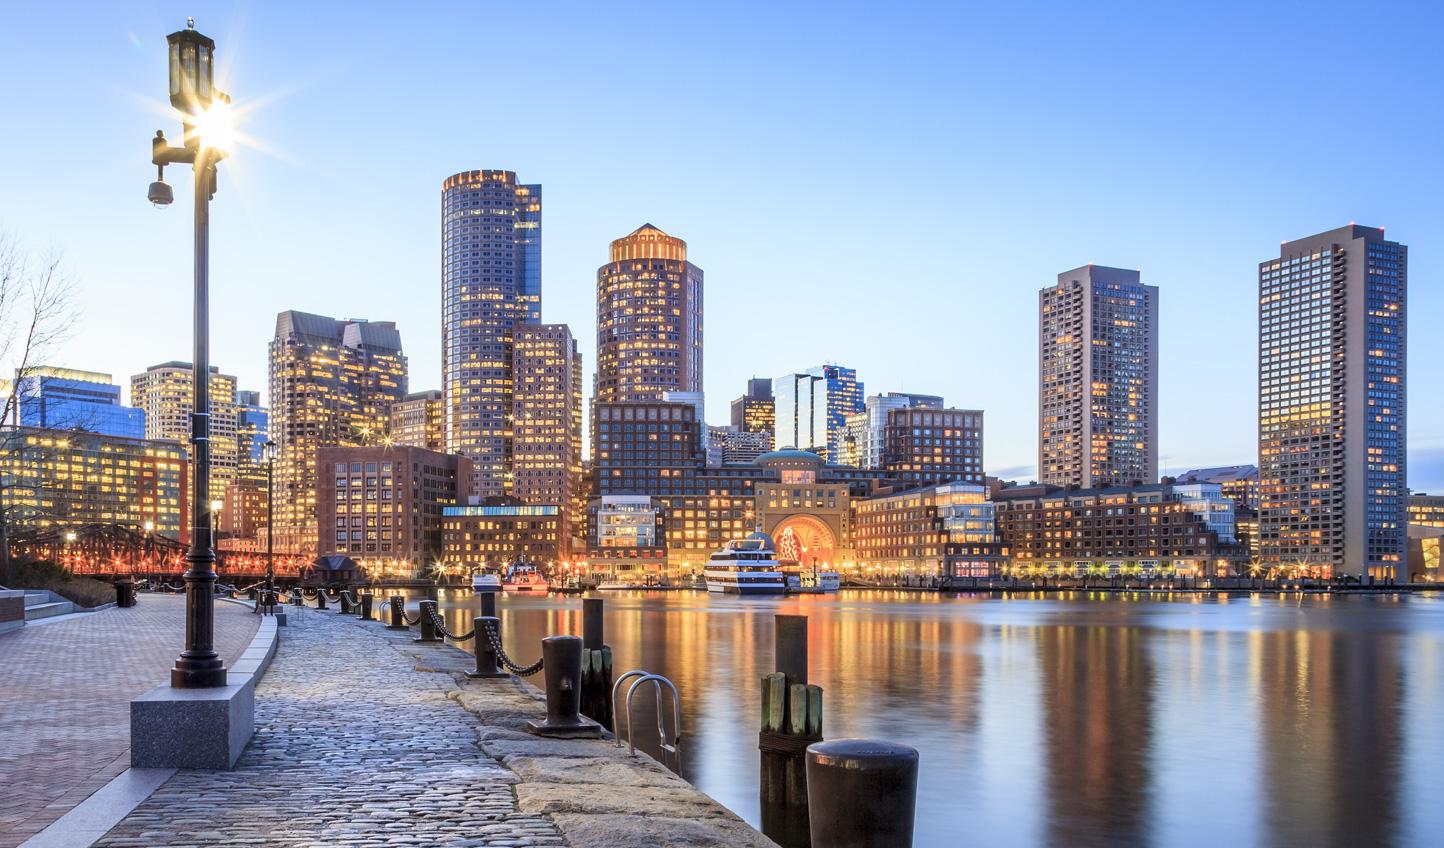 Boston; the gateaway city to New England